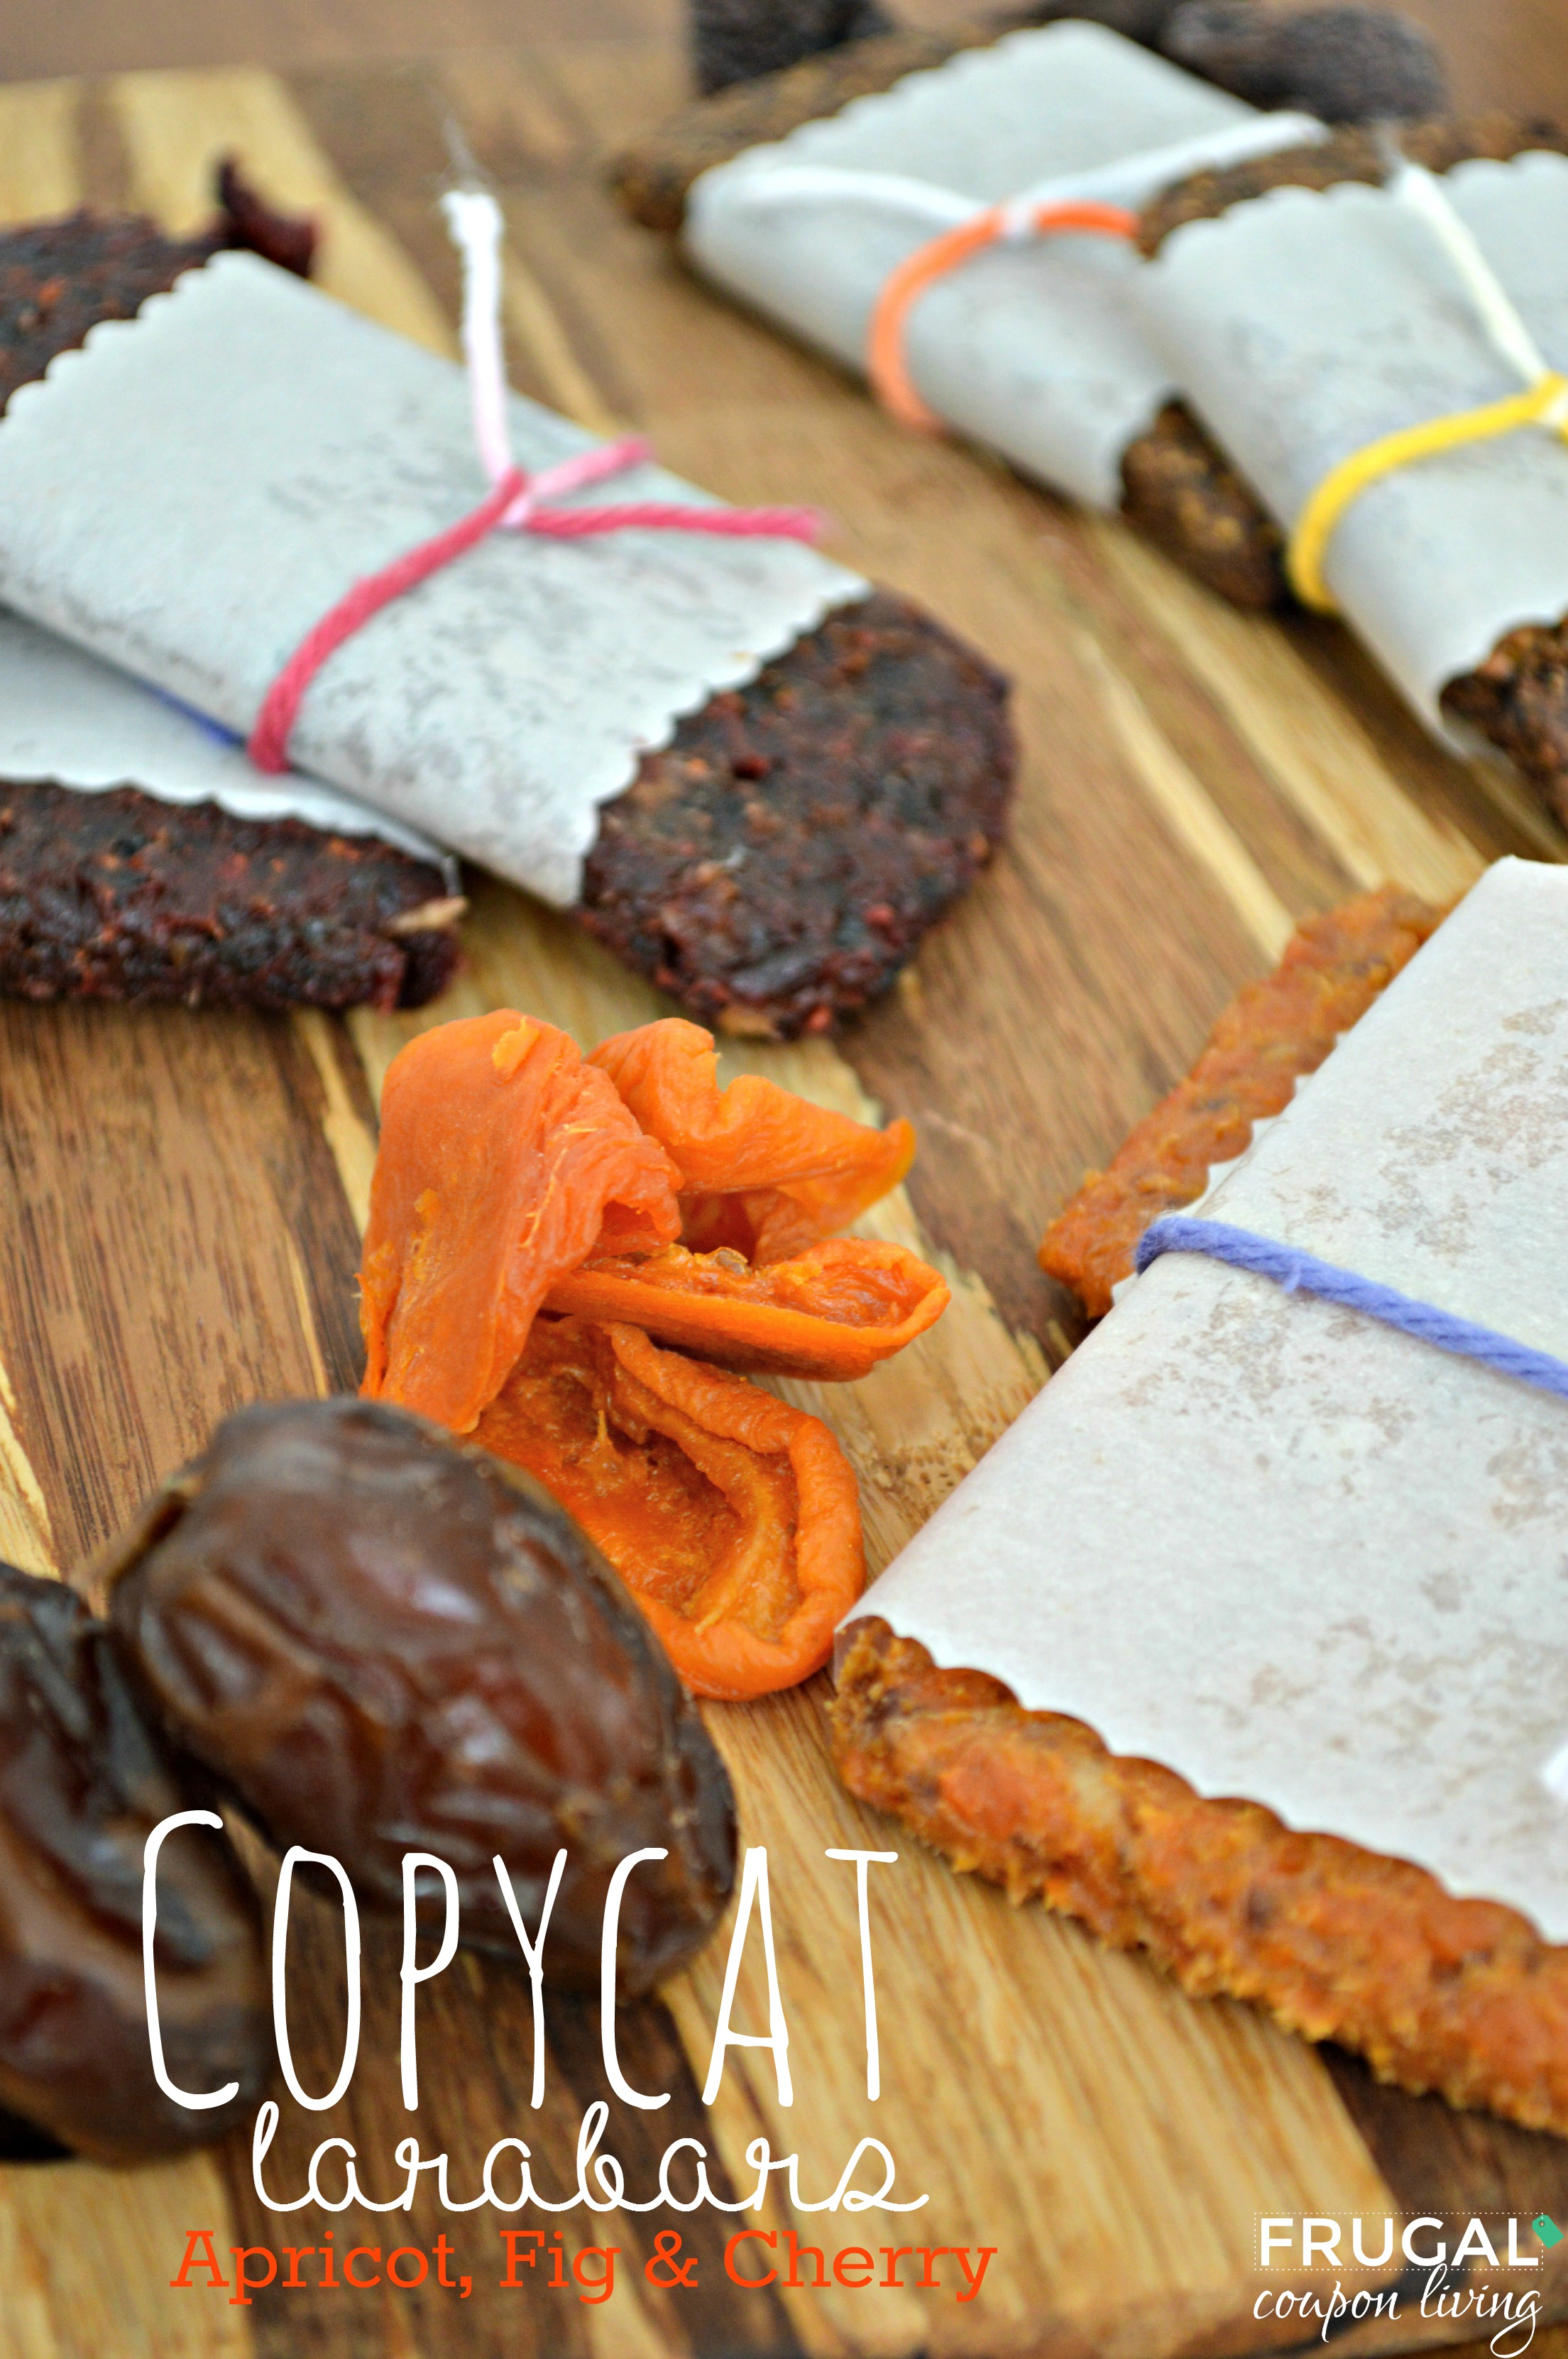 copycat-larabars-recipe-smaller-frugal-coupon-living